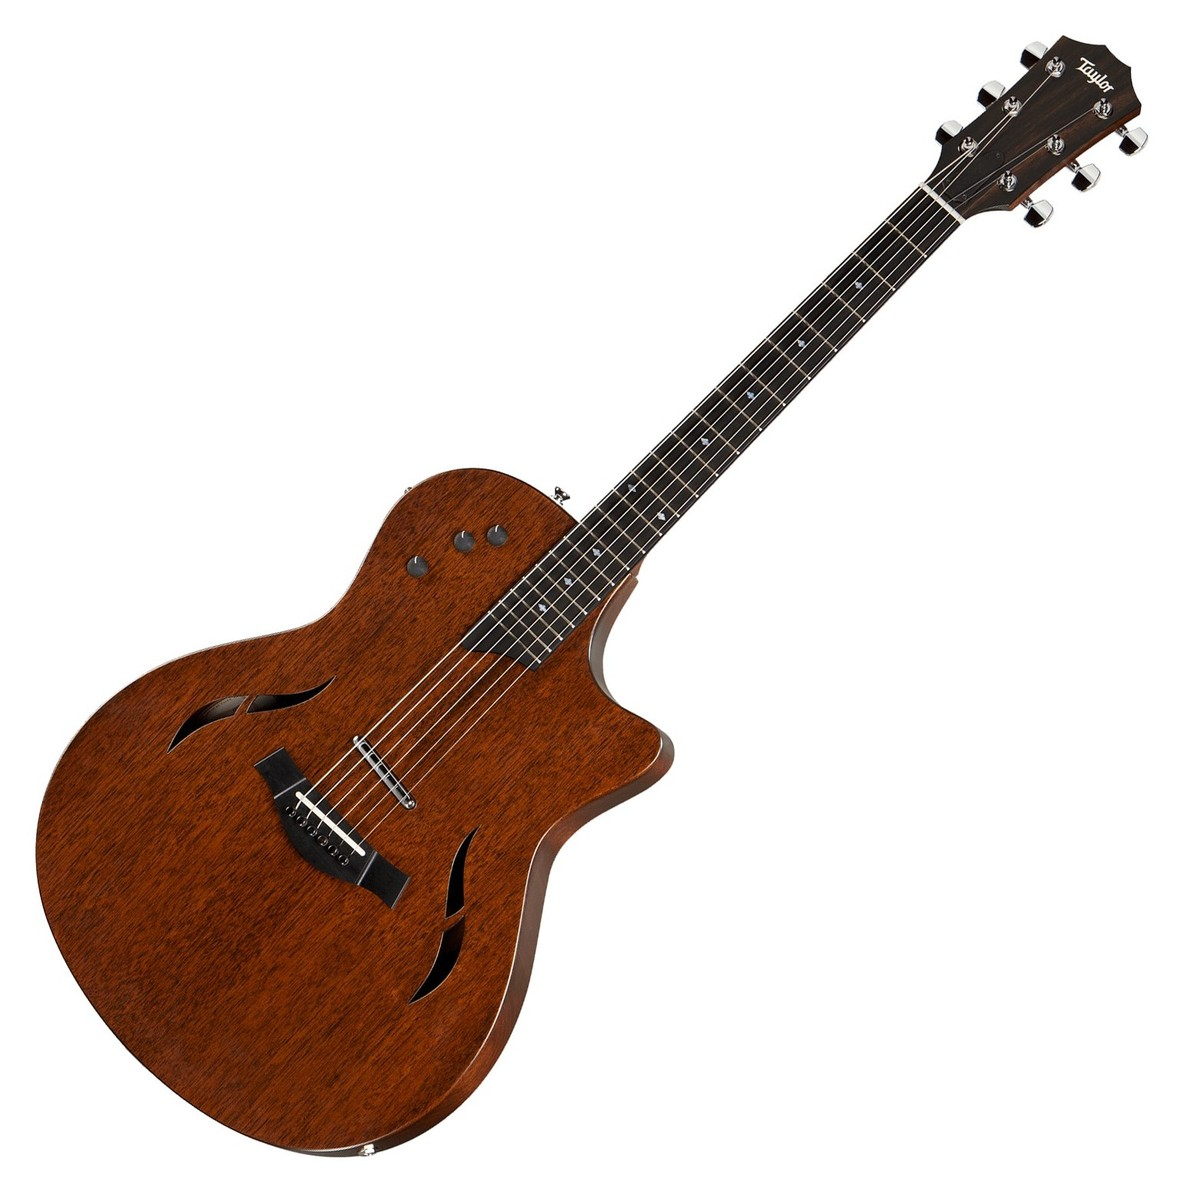 taylor t5 classic mahogany hollowbody electric guitar natural at. Black Bedroom Furniture Sets. Home Design Ideas